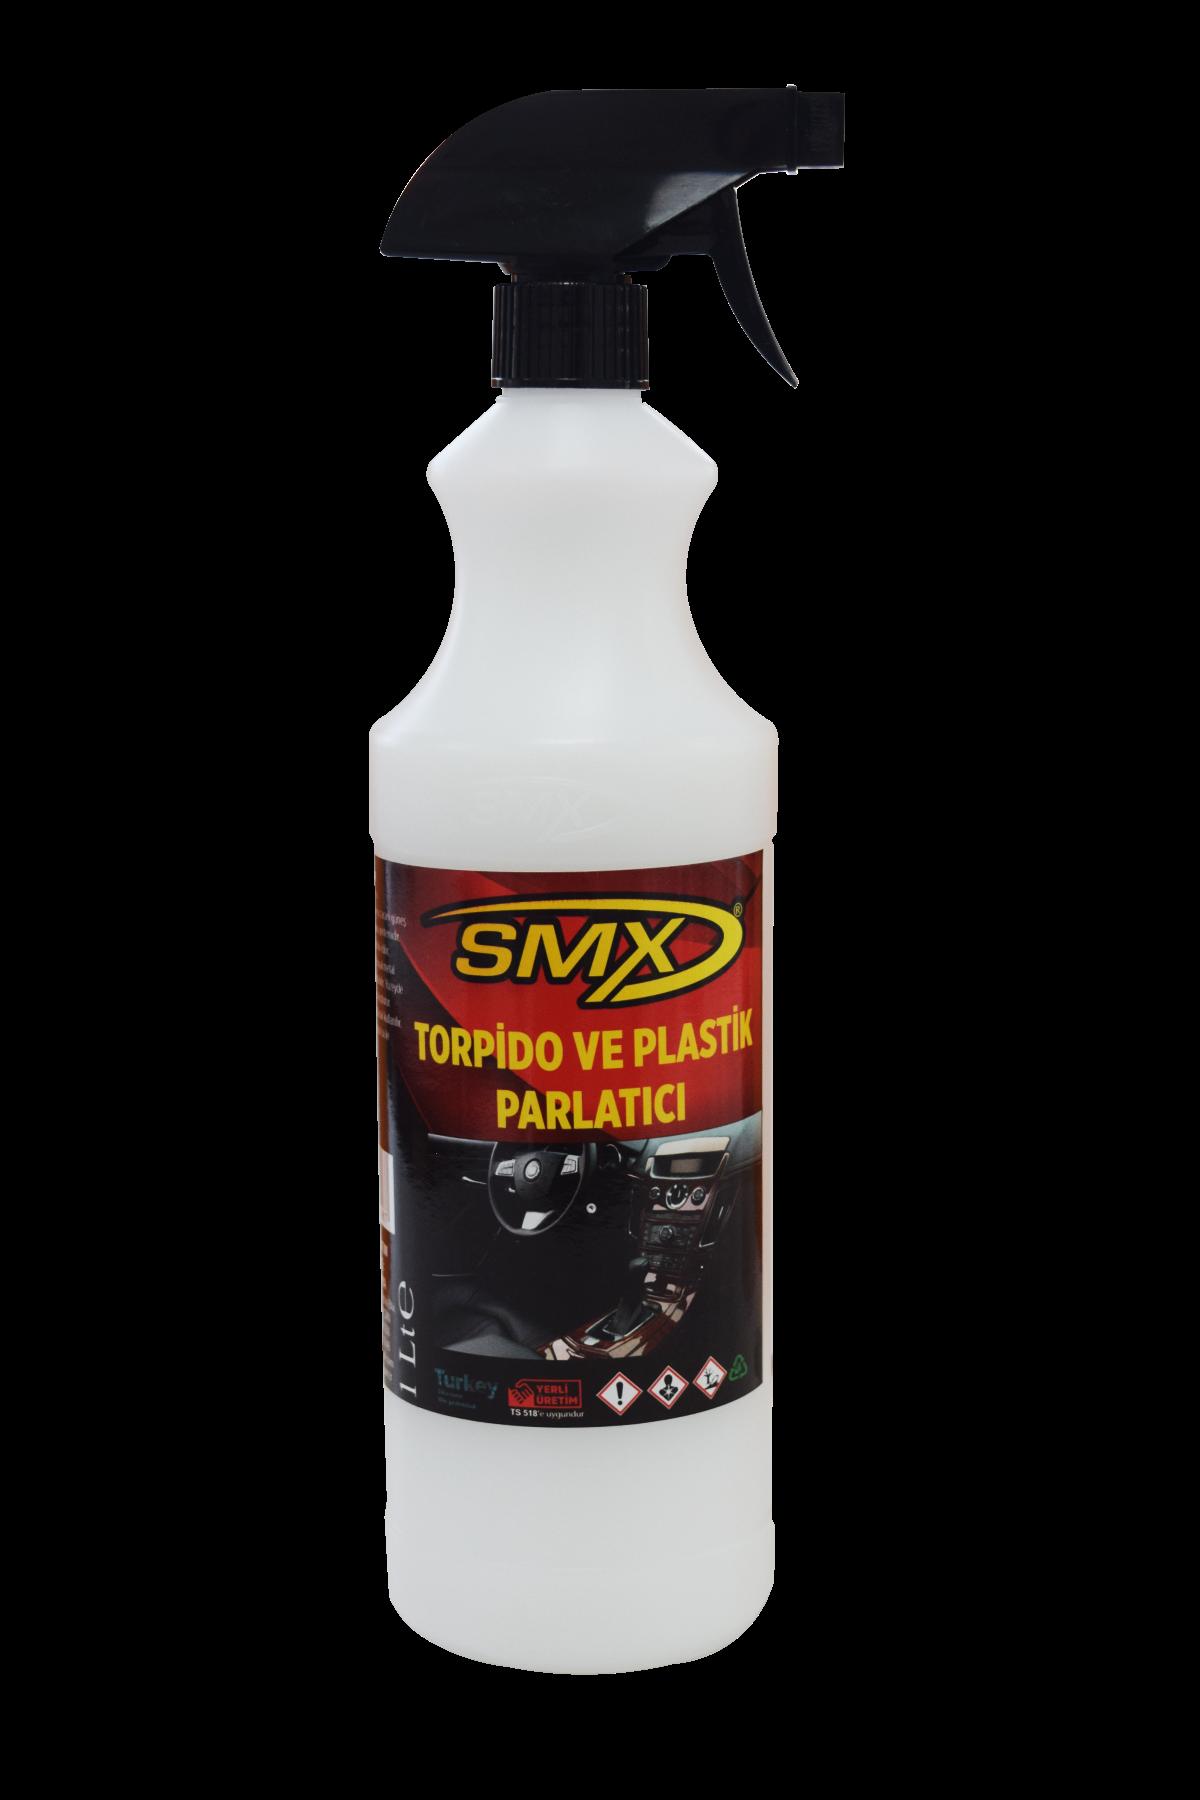 SMX Torpido Parlatıcı / Plastik Aksam Parlatıcı (1 LT)